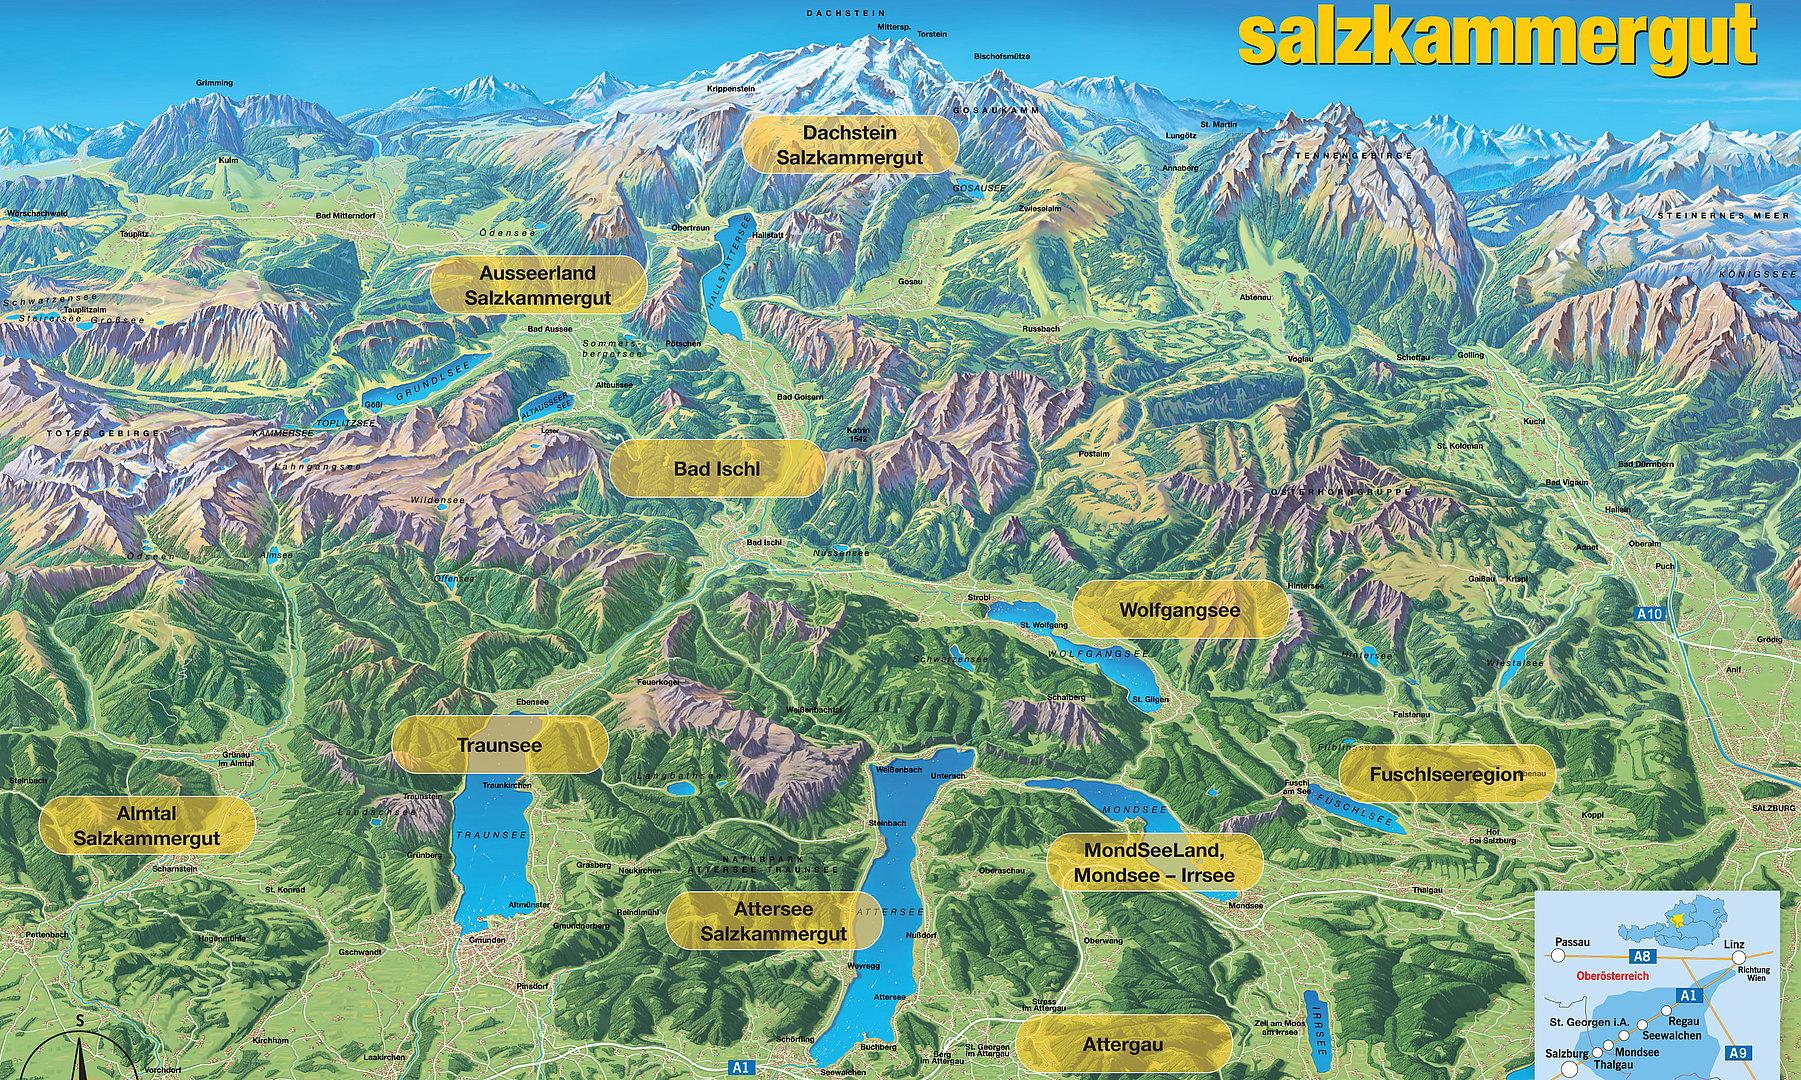 Salzkammergut Karte.Salzkammergut International Strategy By Michi Pm 88 On Emaze